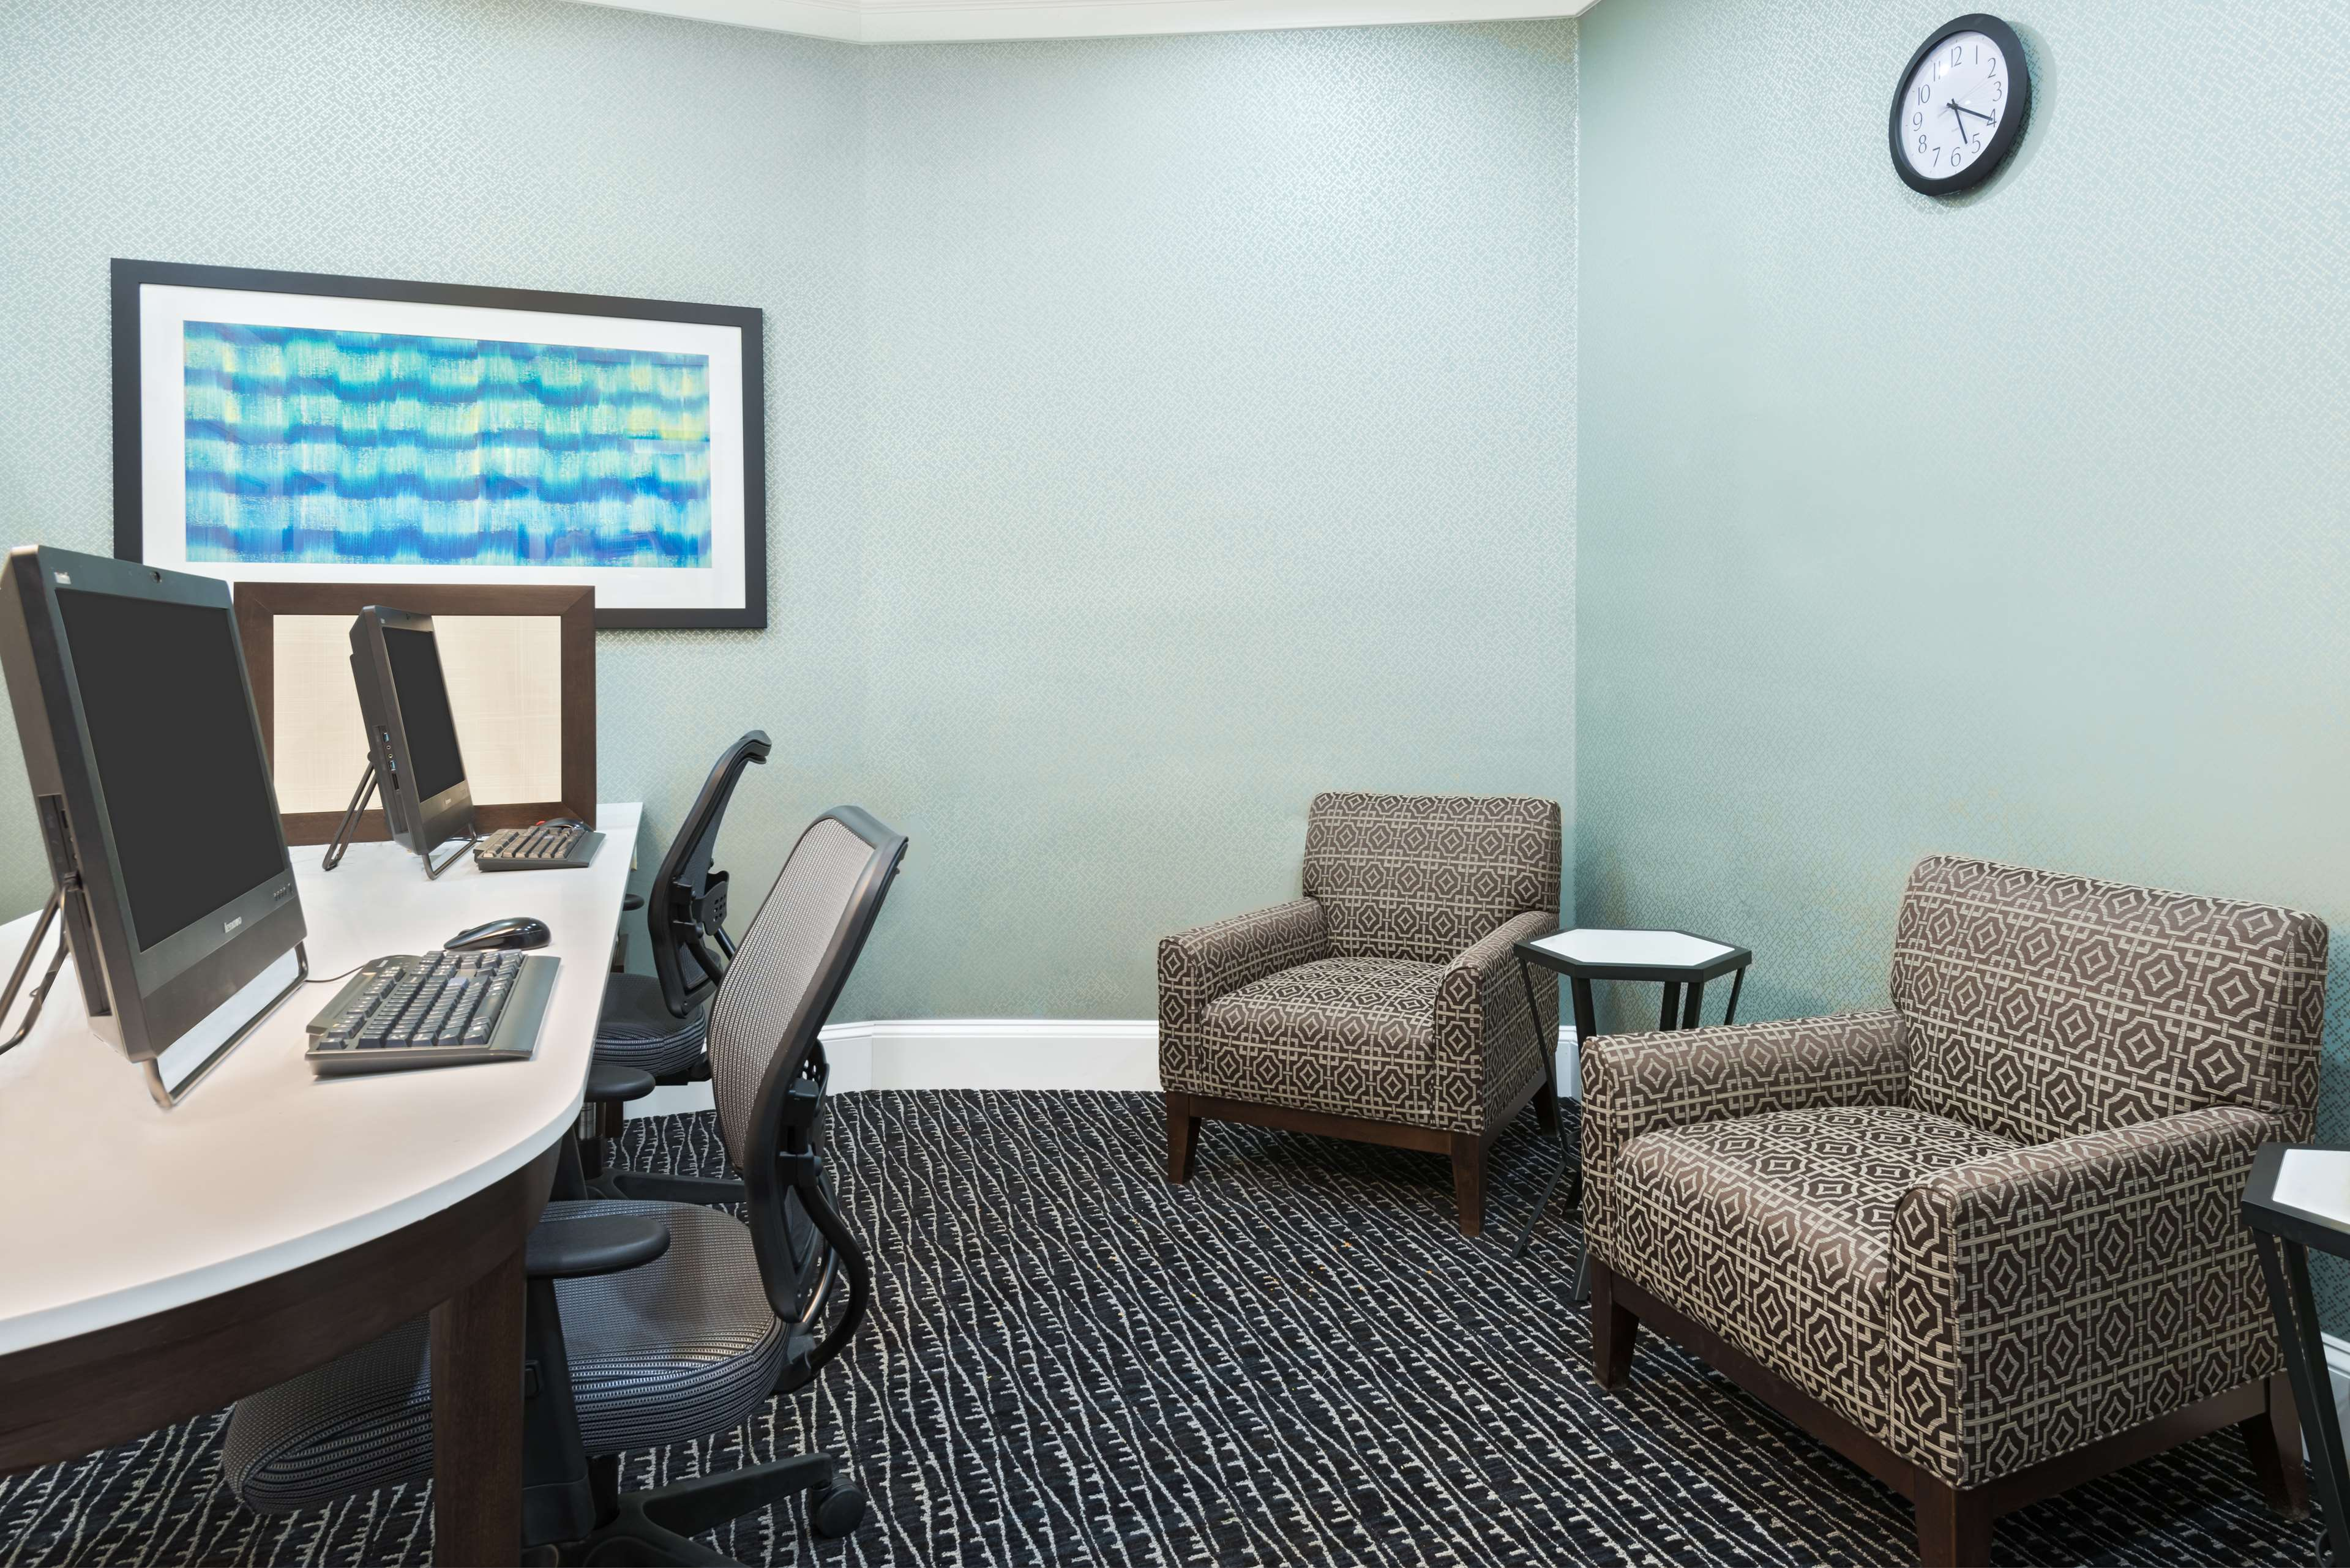 Homewood Suites by Hilton Charlotte-North/Univ Research Park image 22